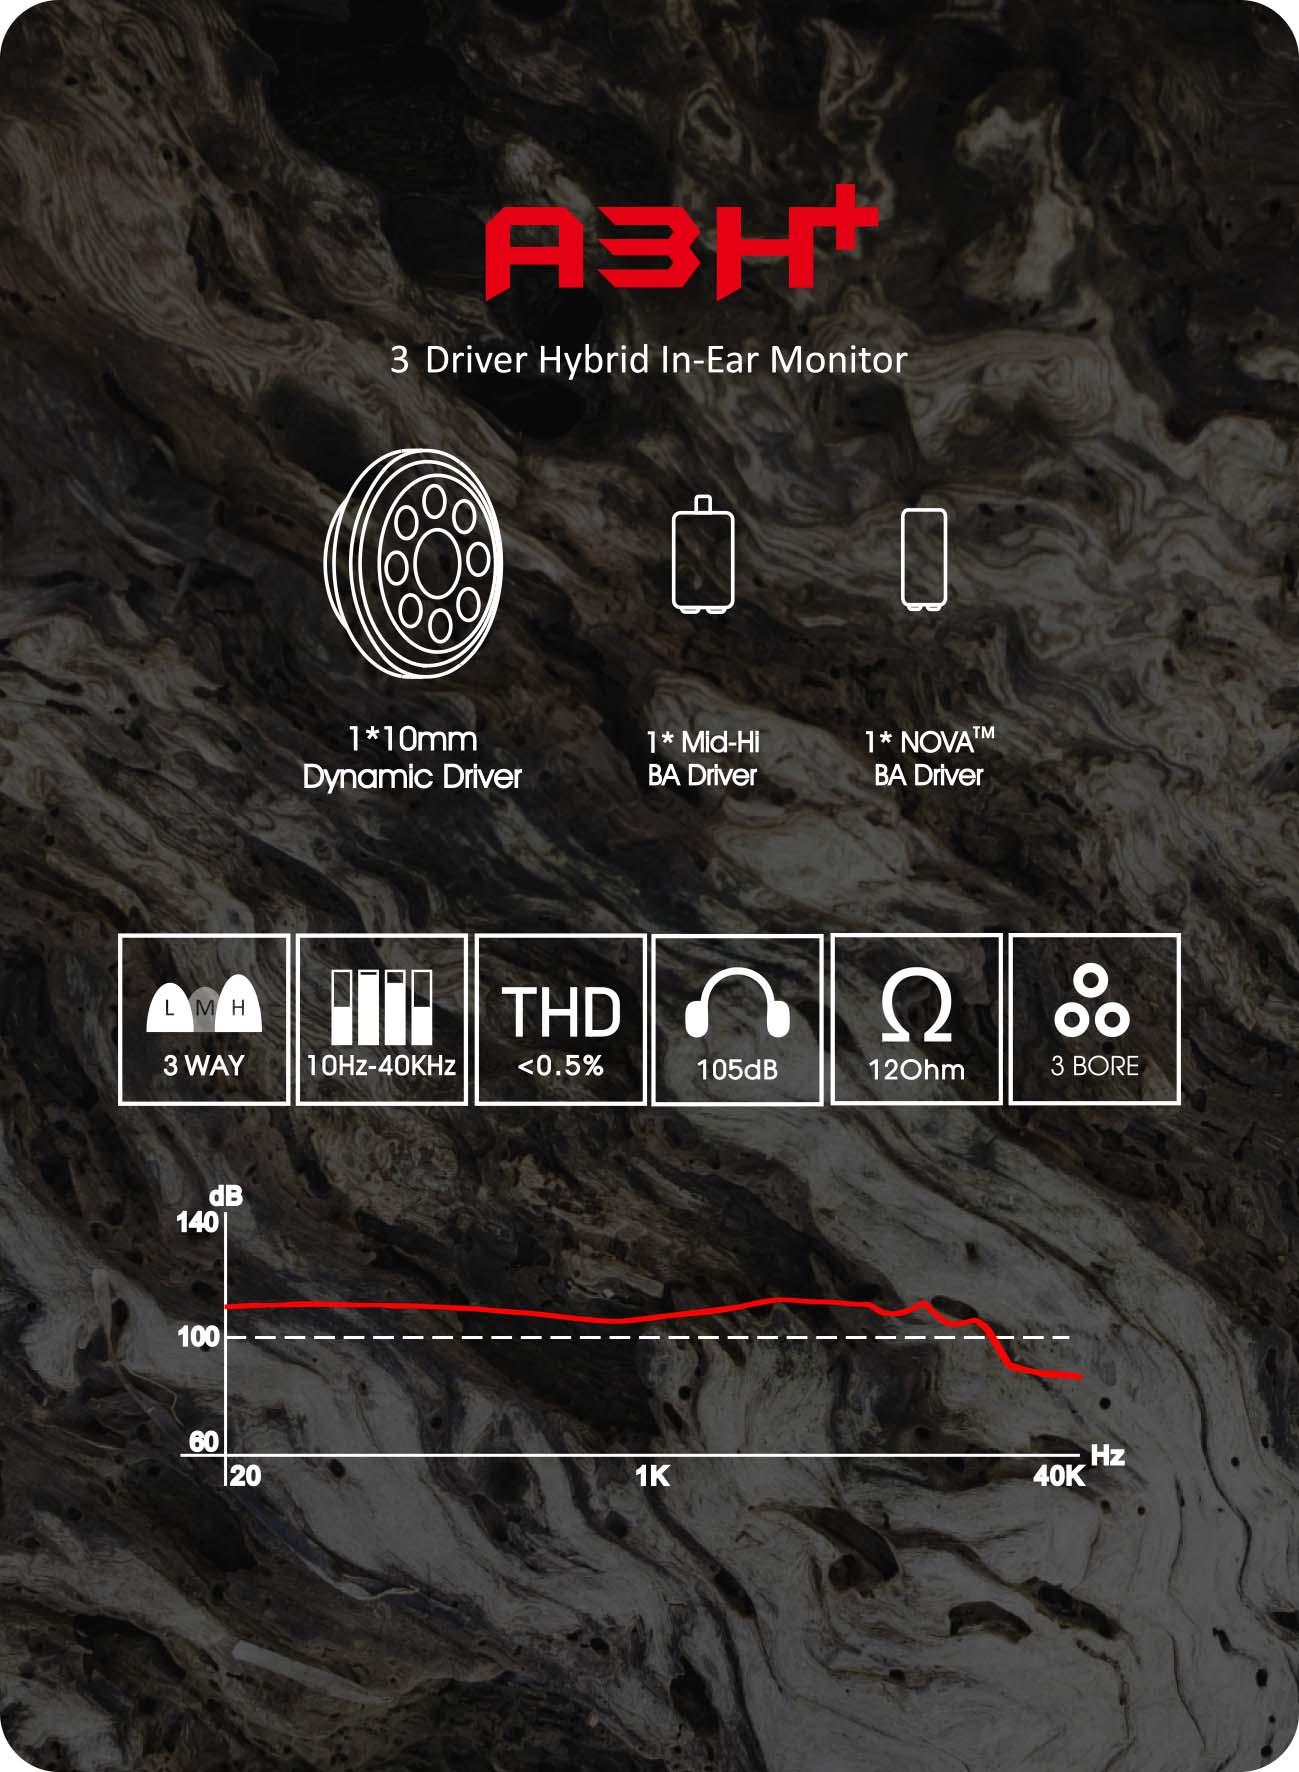 AAW ออกรุ่นใหม่ รุ่น A3H+ หน้าตาดีมาก สเปคแรงกว่าเดิม เพิ่มเติมคือความหล่อที่เรียกว่าโดนใจเลยทีเดียวละครับ เร็วๆนี้ที่ Soundproofbros